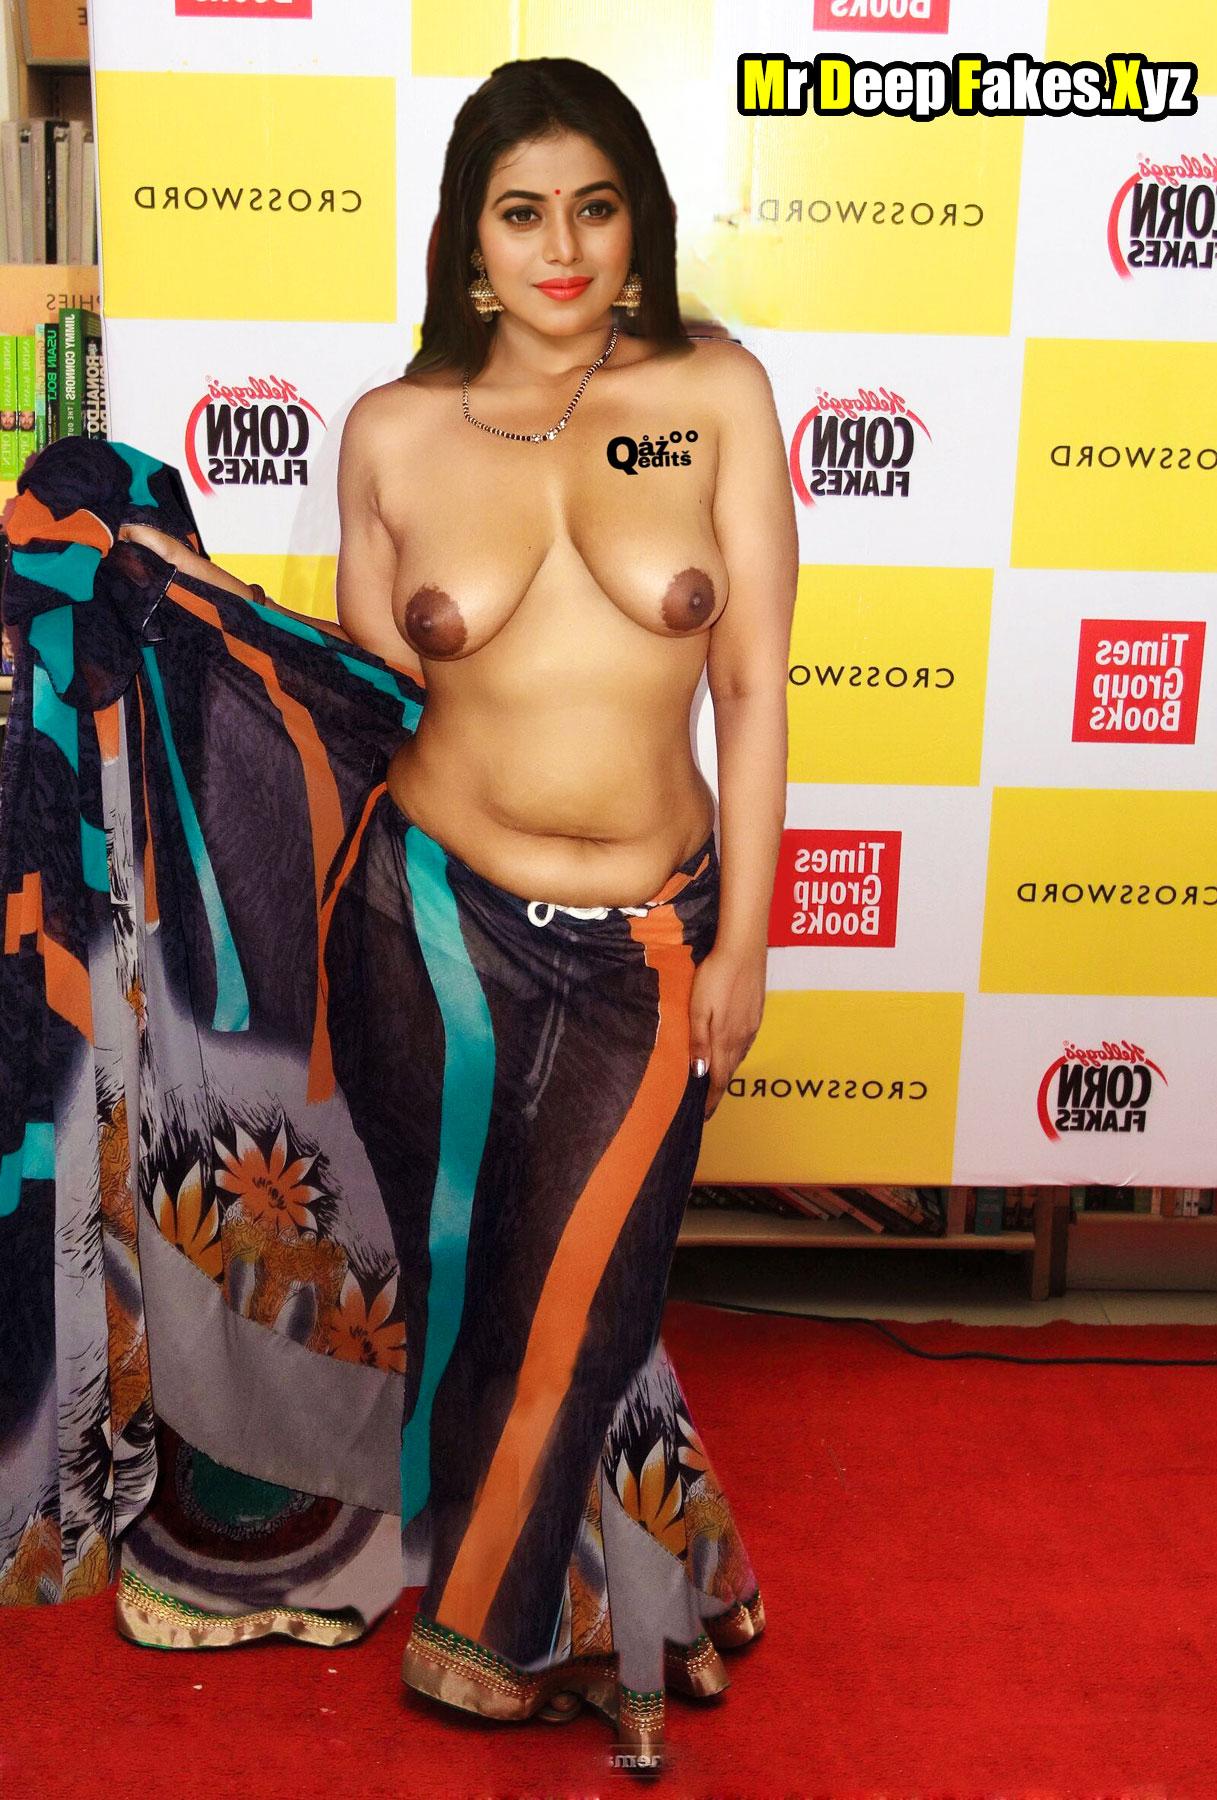 Topless Poorna topless Telegu movie press meet public show actress nude boobs